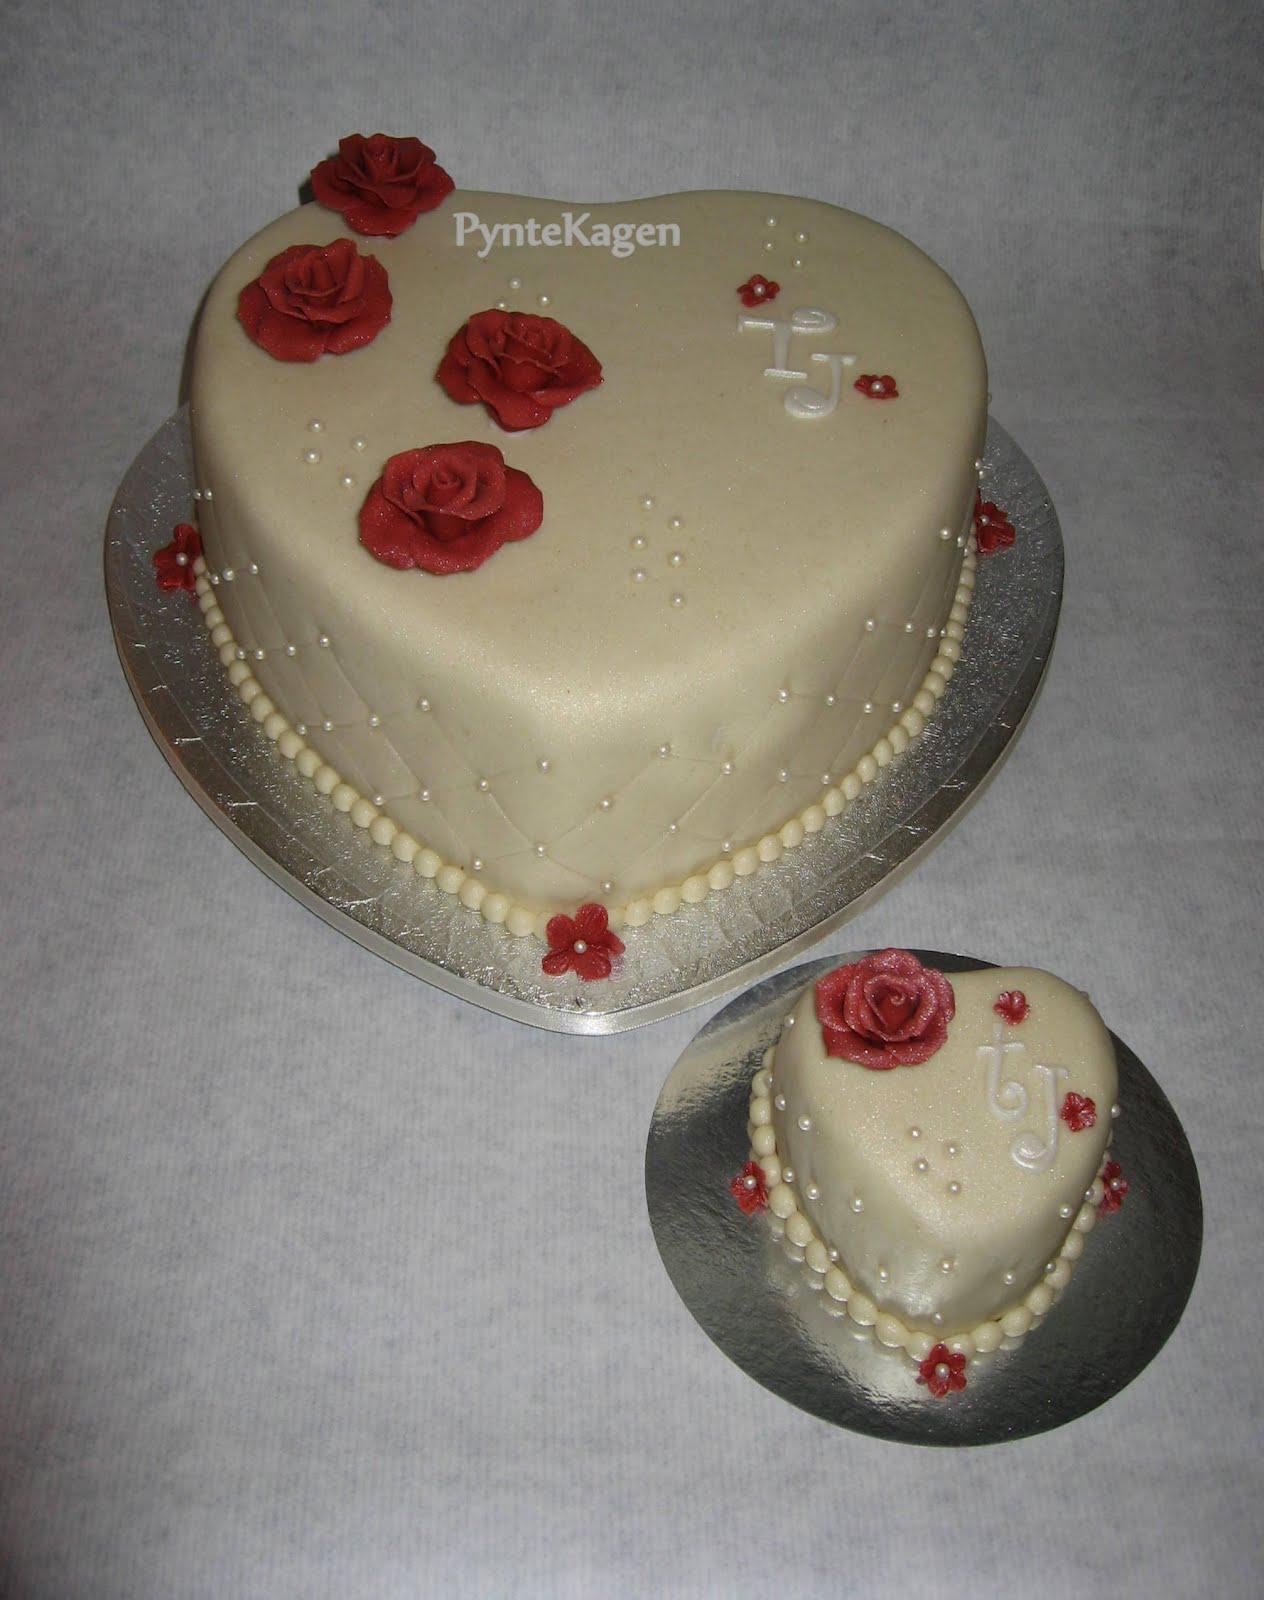 kage med marcipan